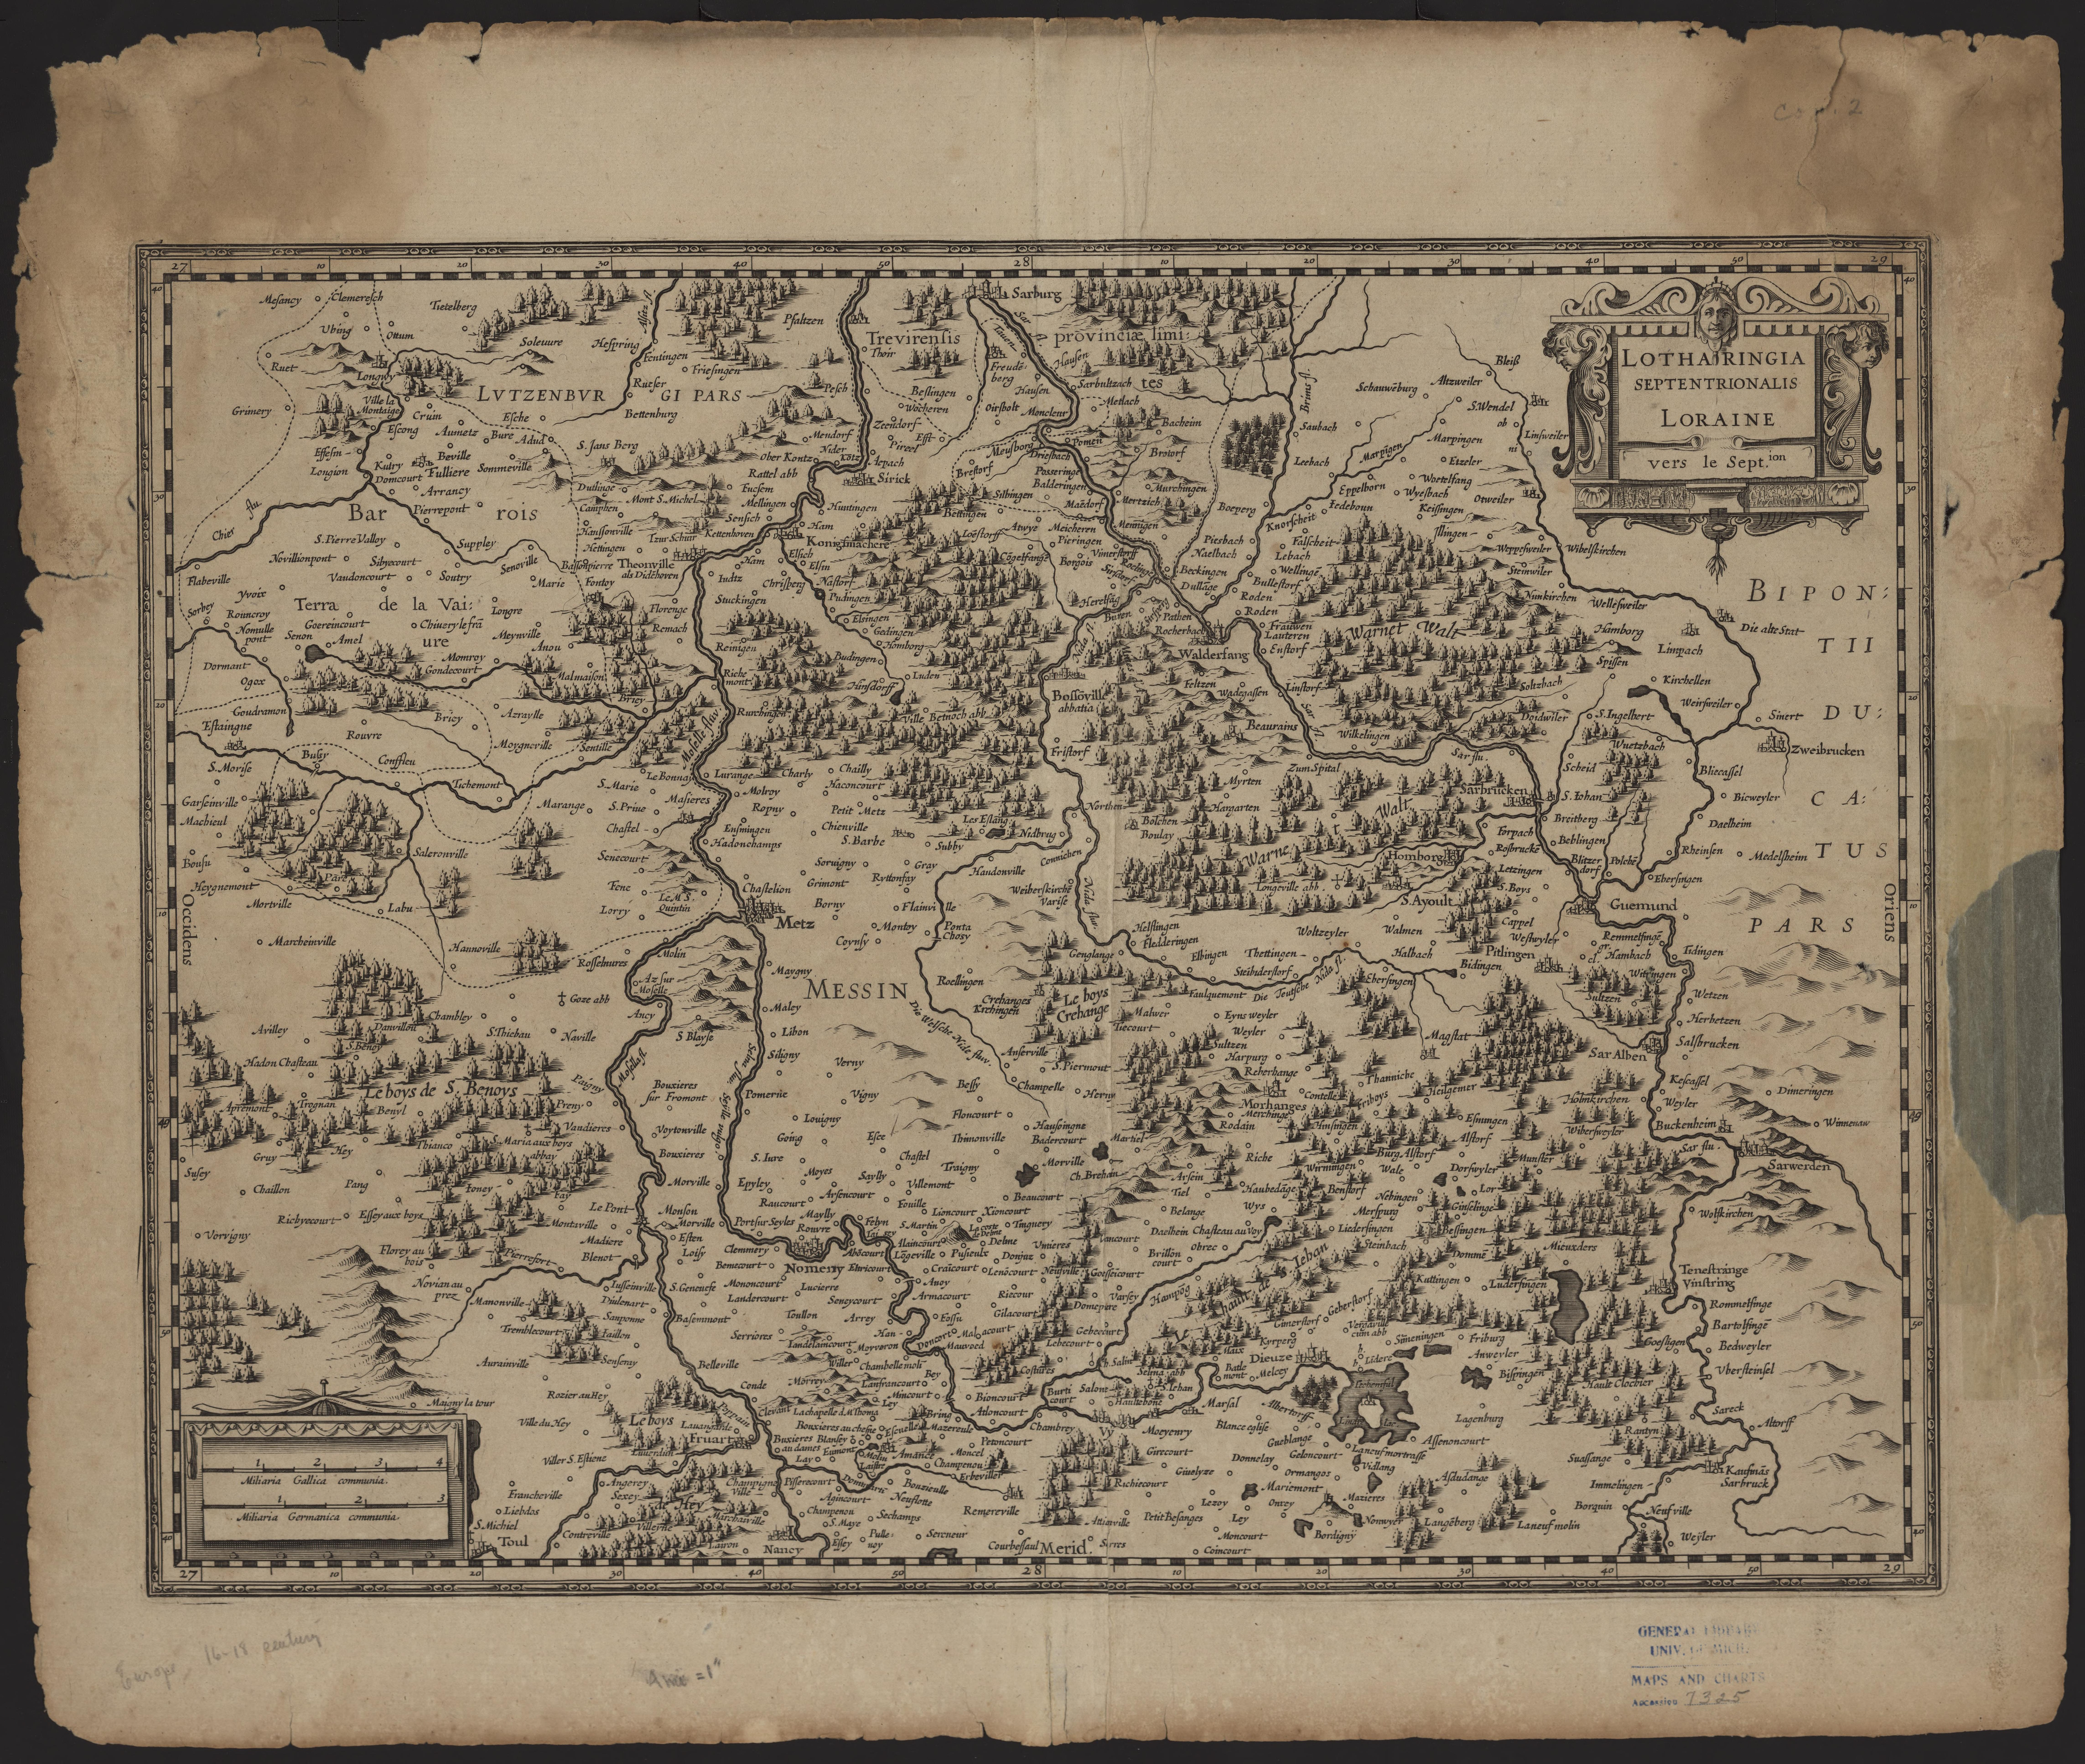 UM Clark Library Maps: Lotharingia septentrionalis Loraine : vers le Sept. ion.